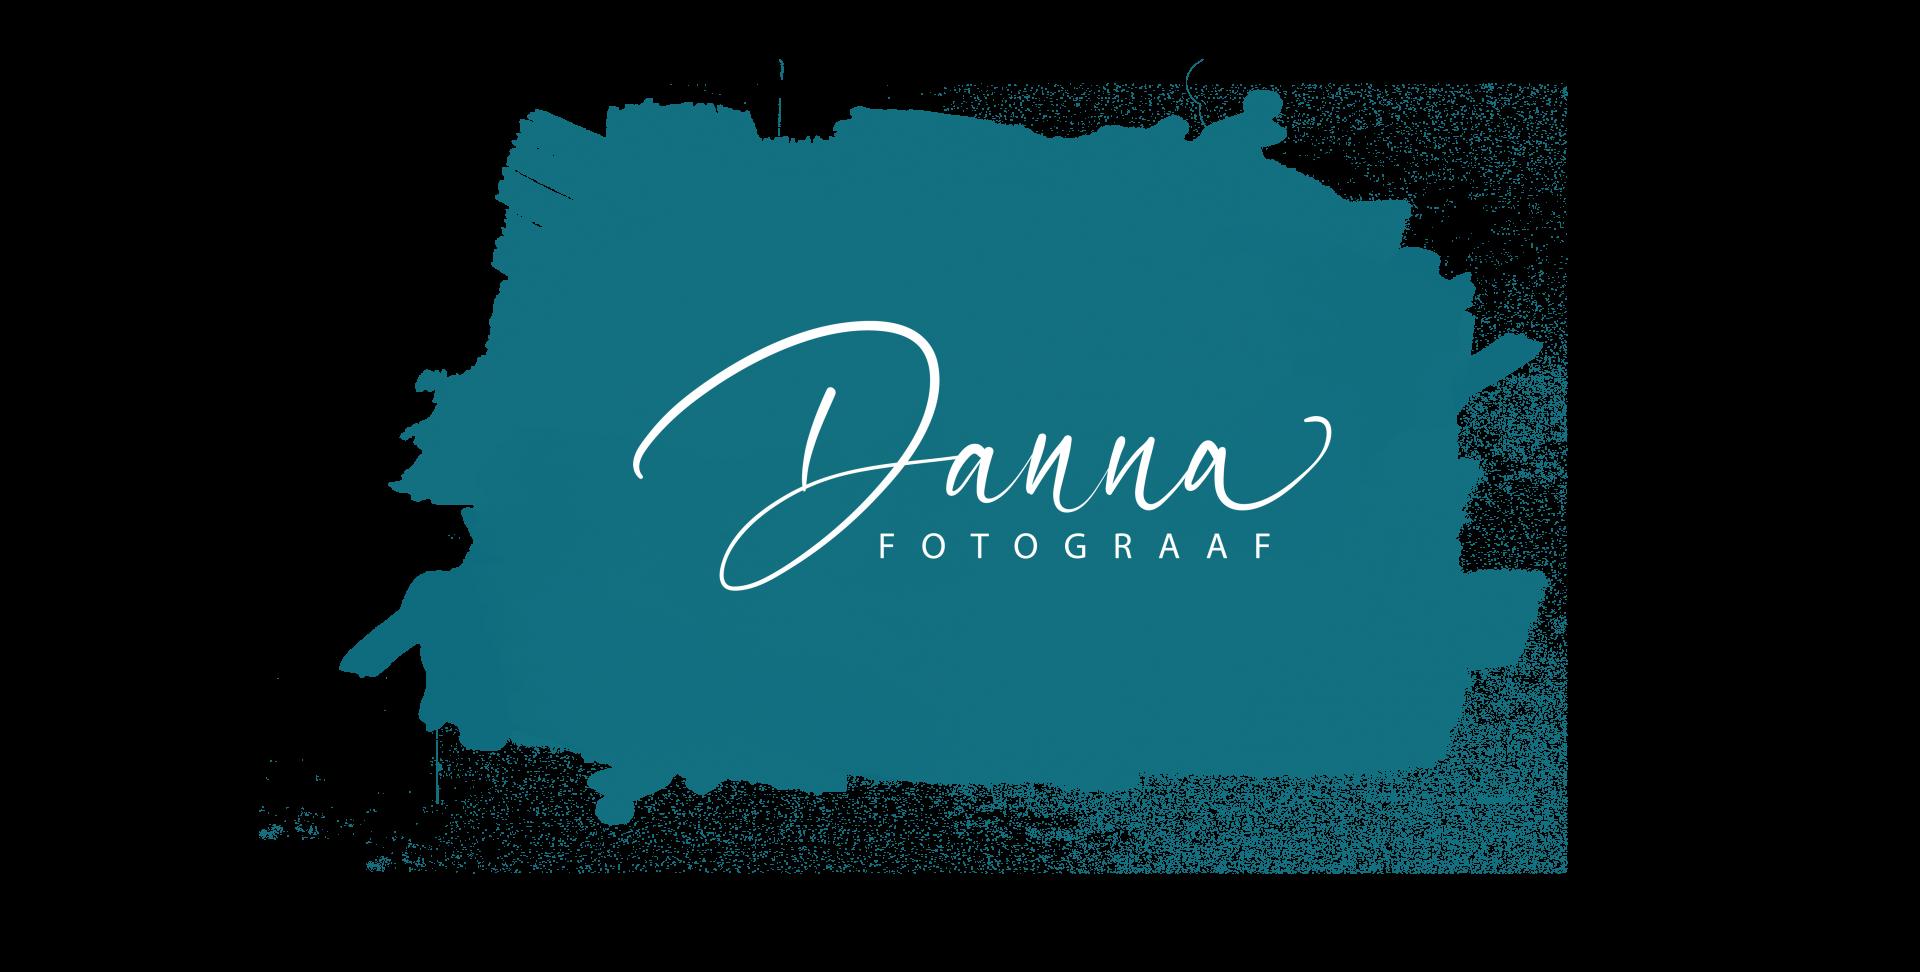 Danna van Daal - Fotograaf